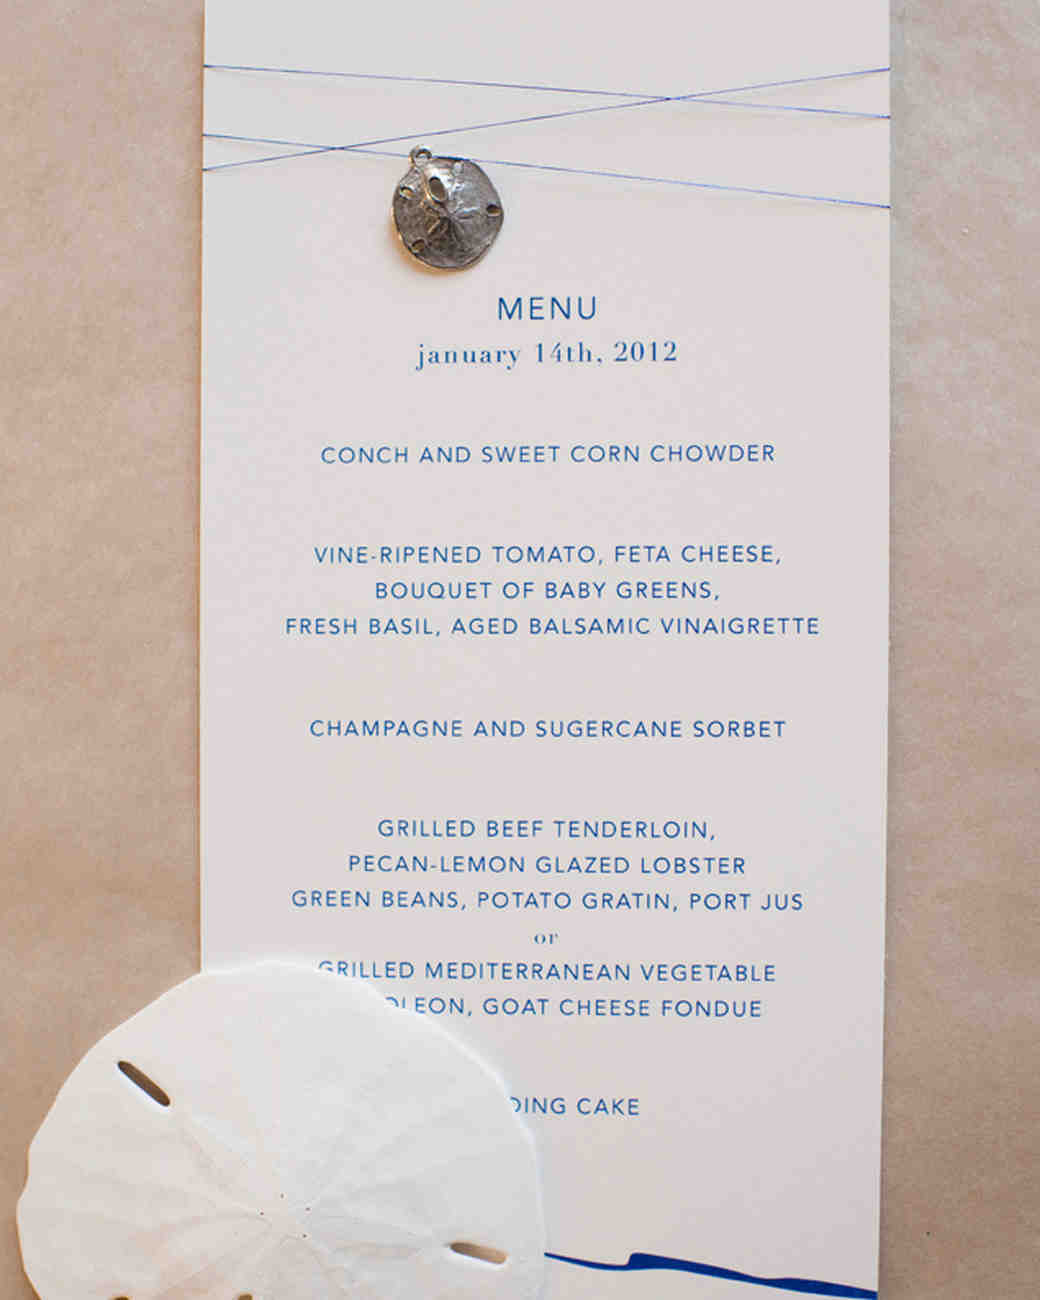 menu-card-5.jpg